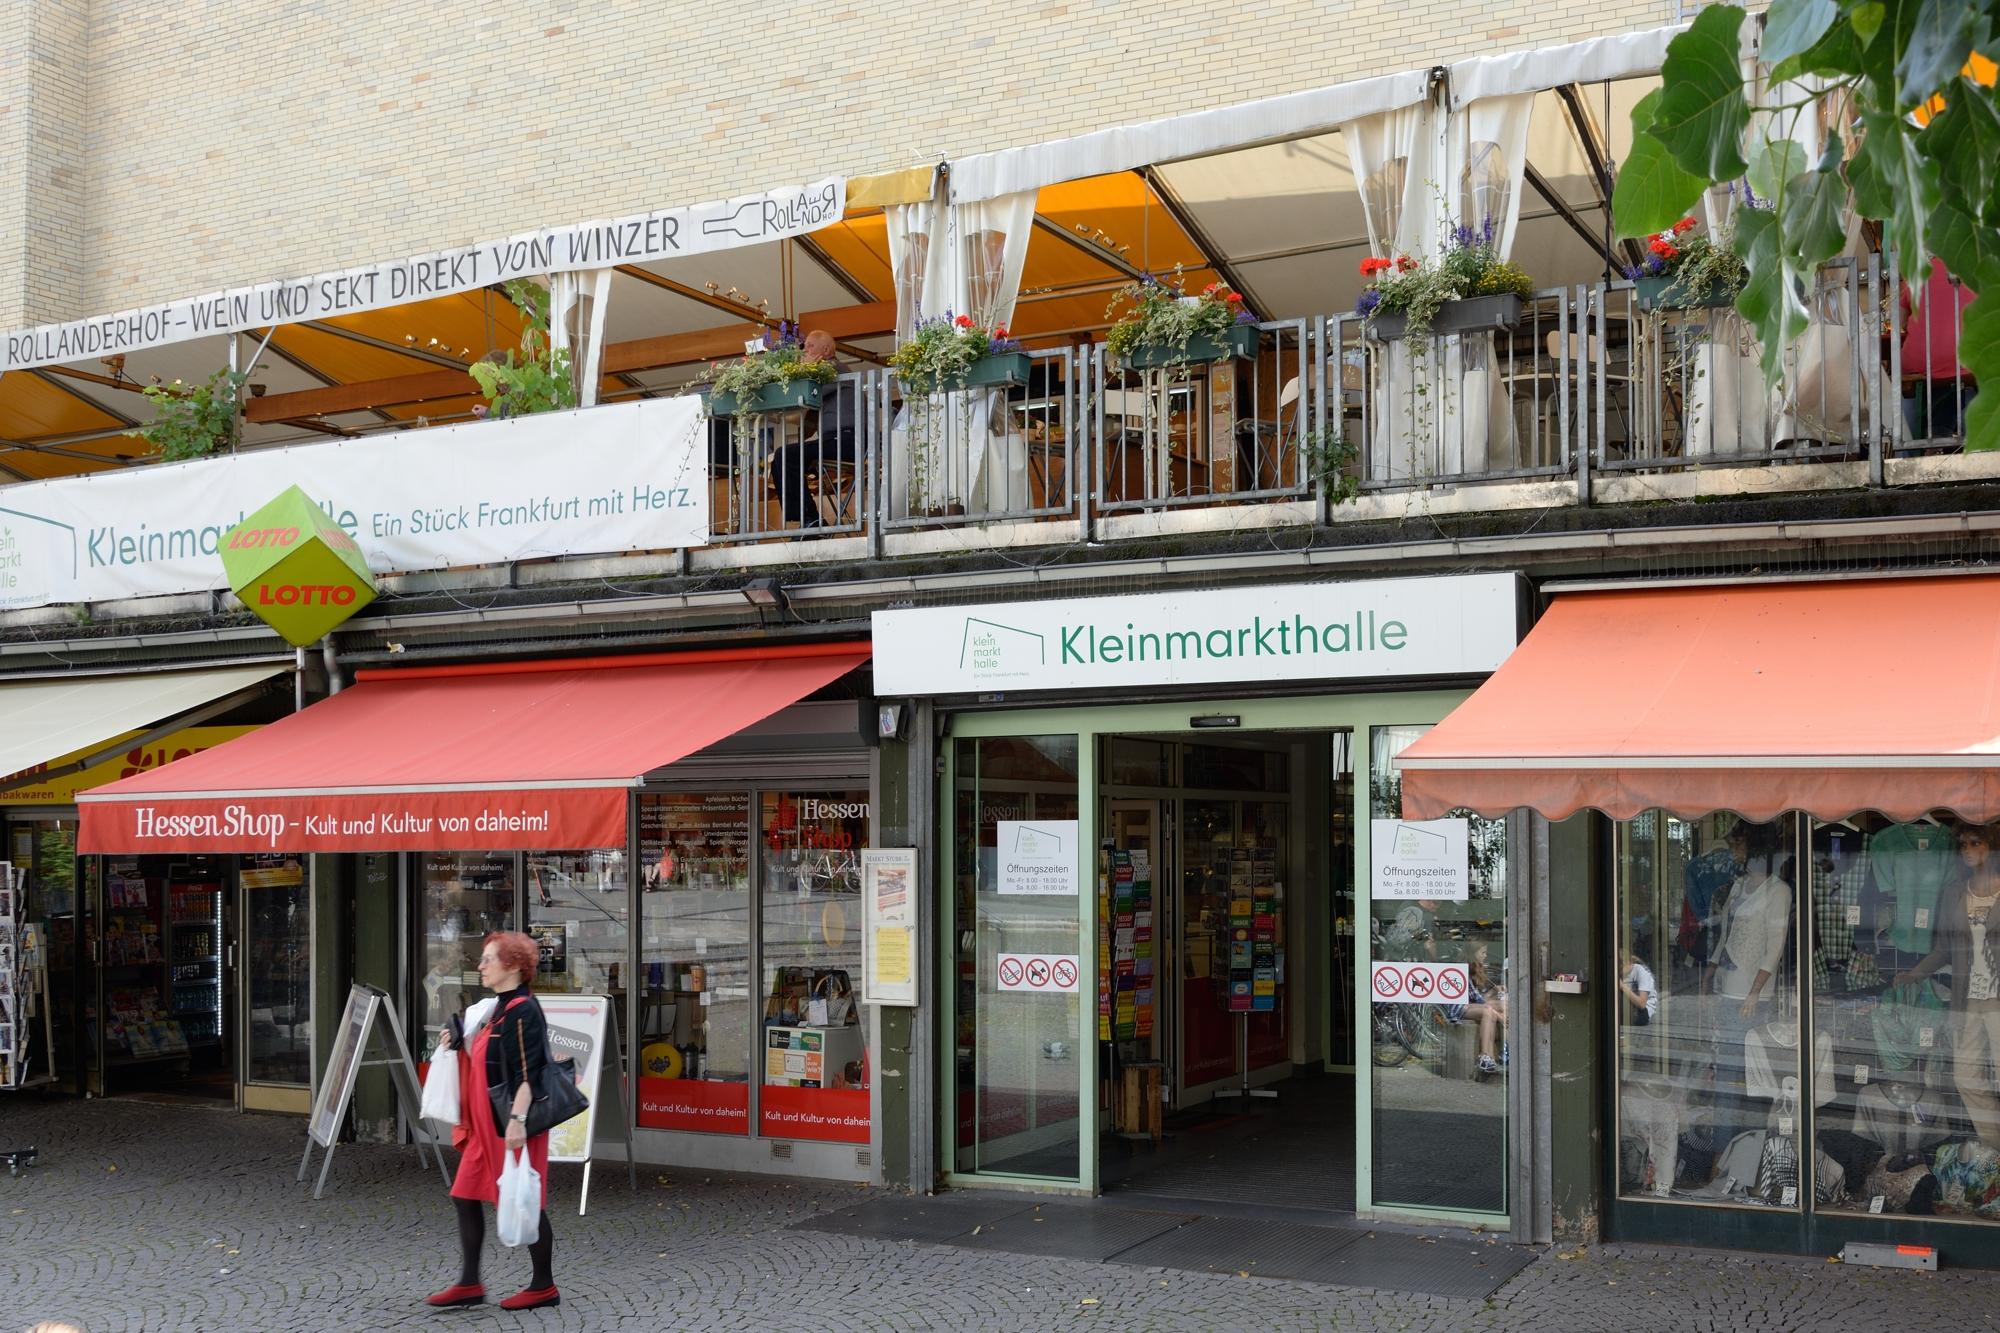 Rollanderhof, above the back exit of the Kleinmarkthalle, serving Federweisser!